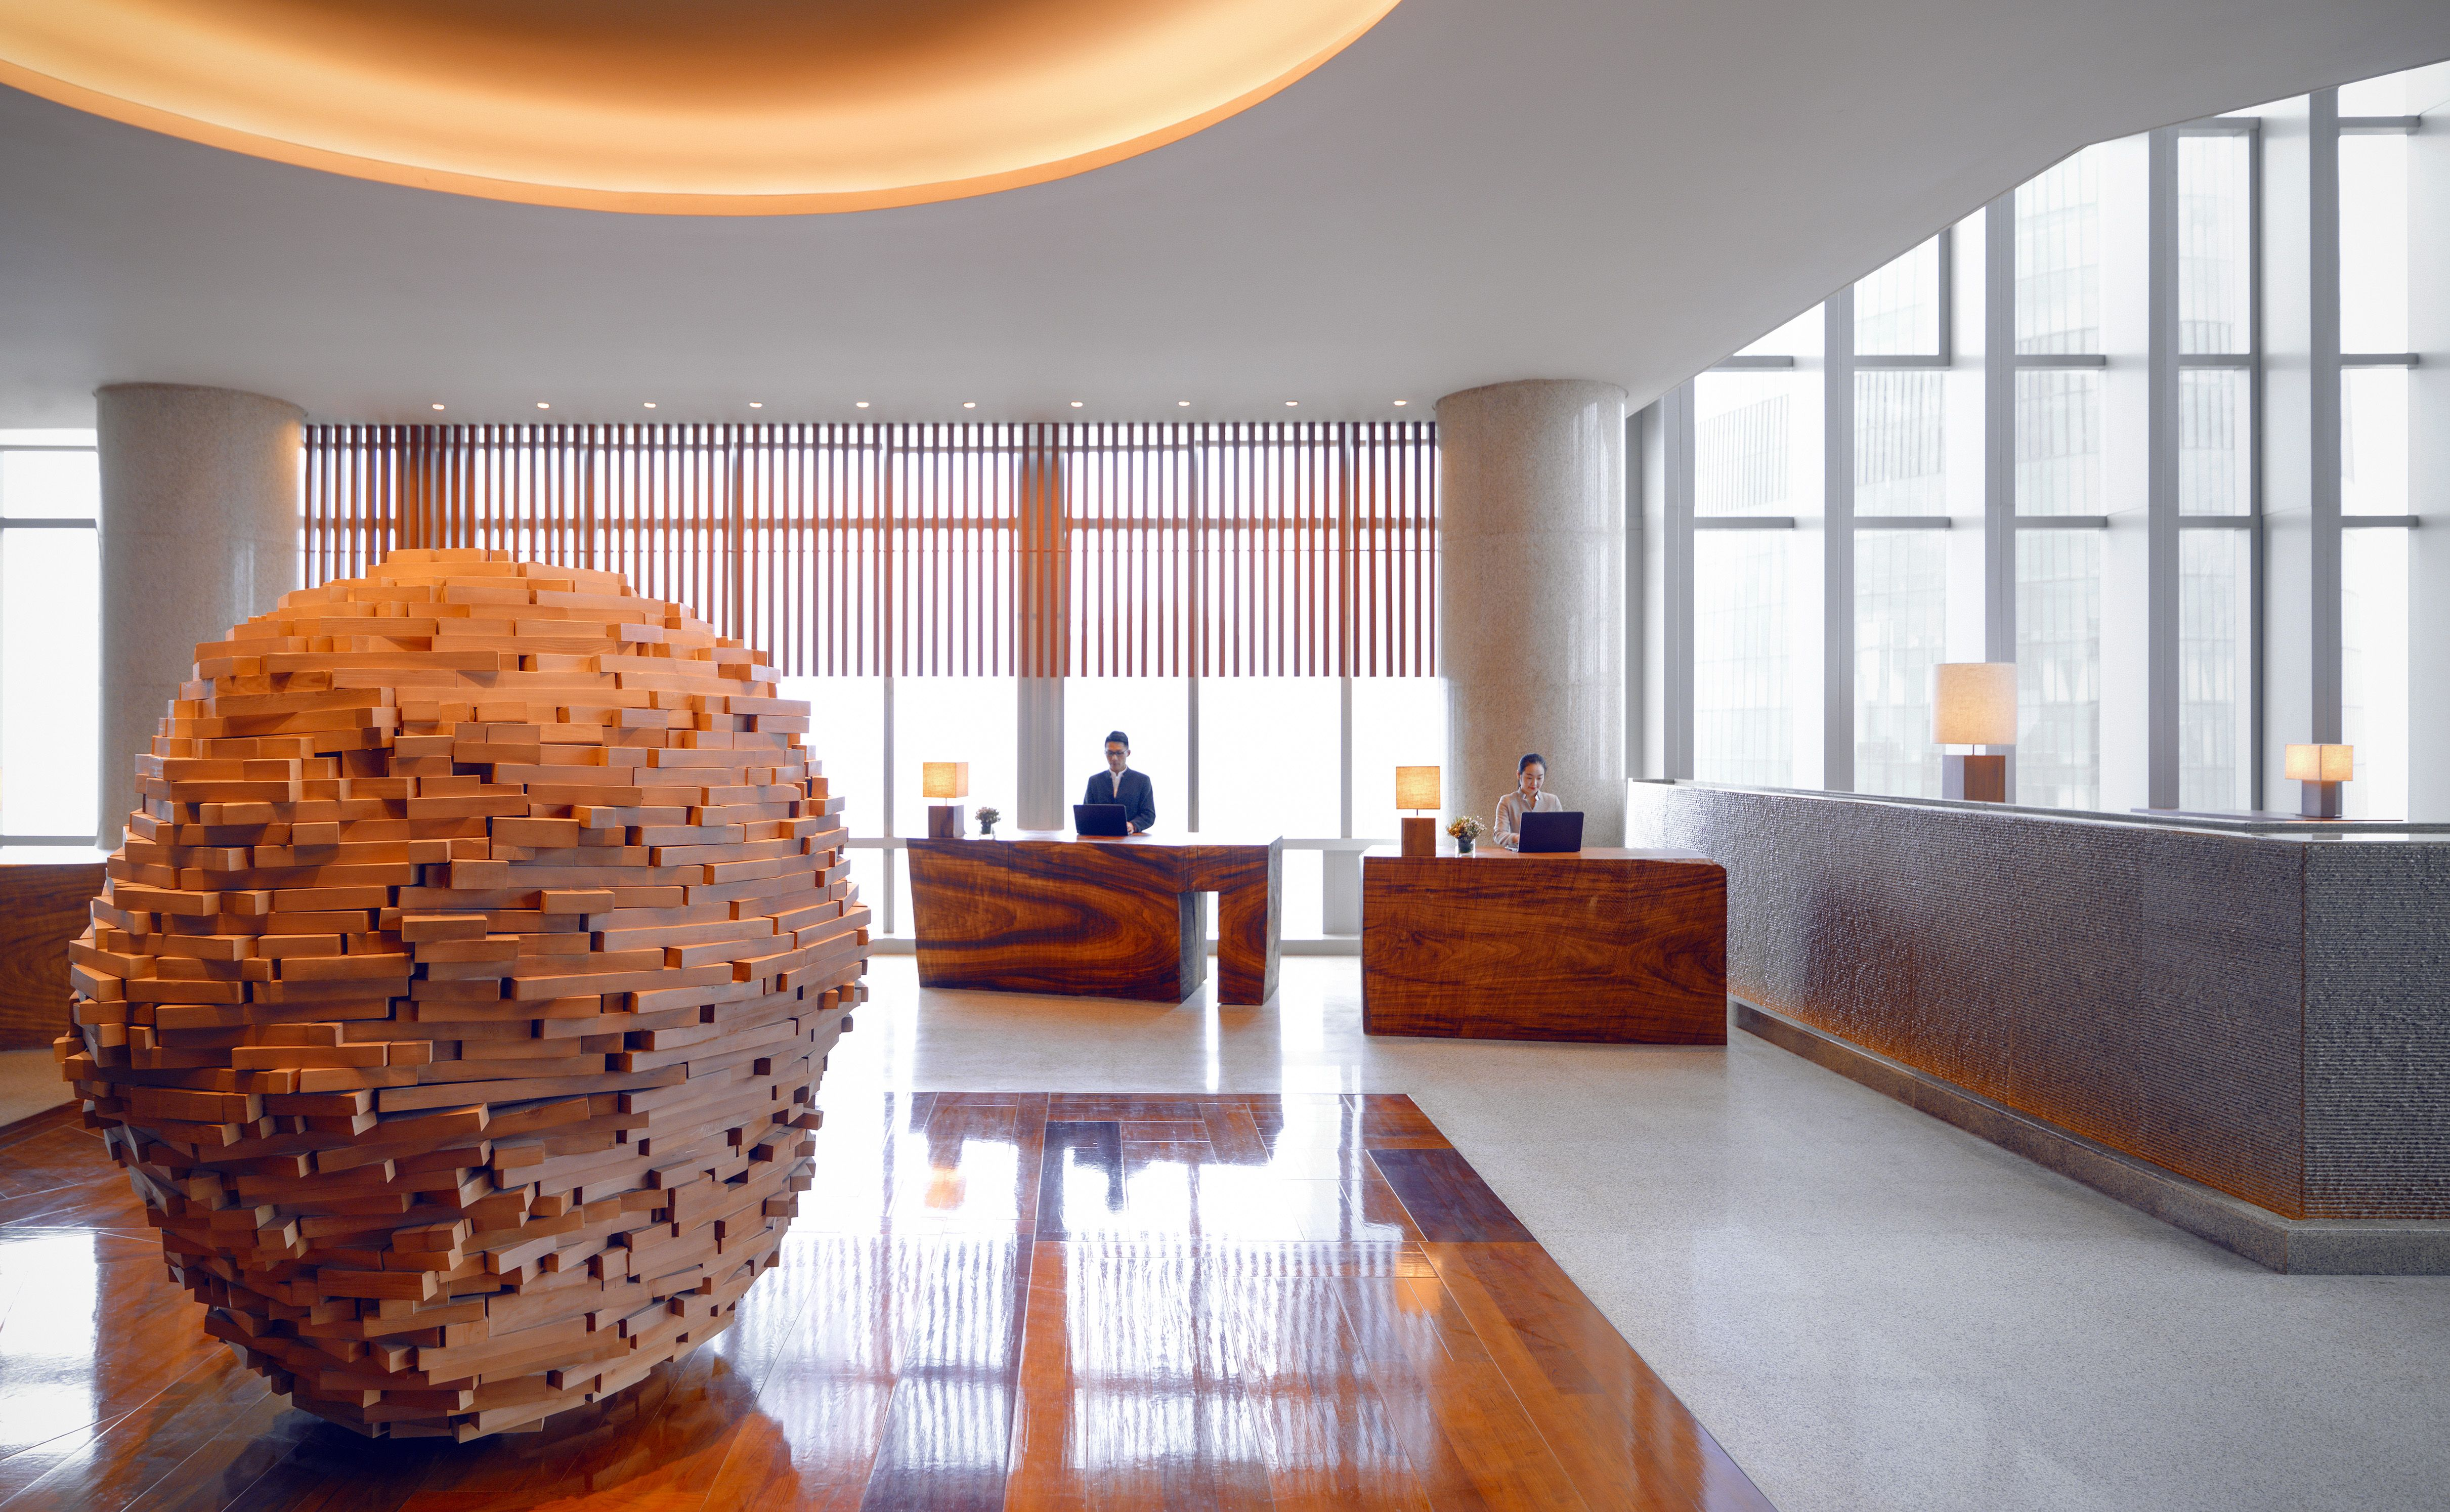 Park Hyatt Guangzhou China Sky Lobby Hotel Lounge Luxury Hotel